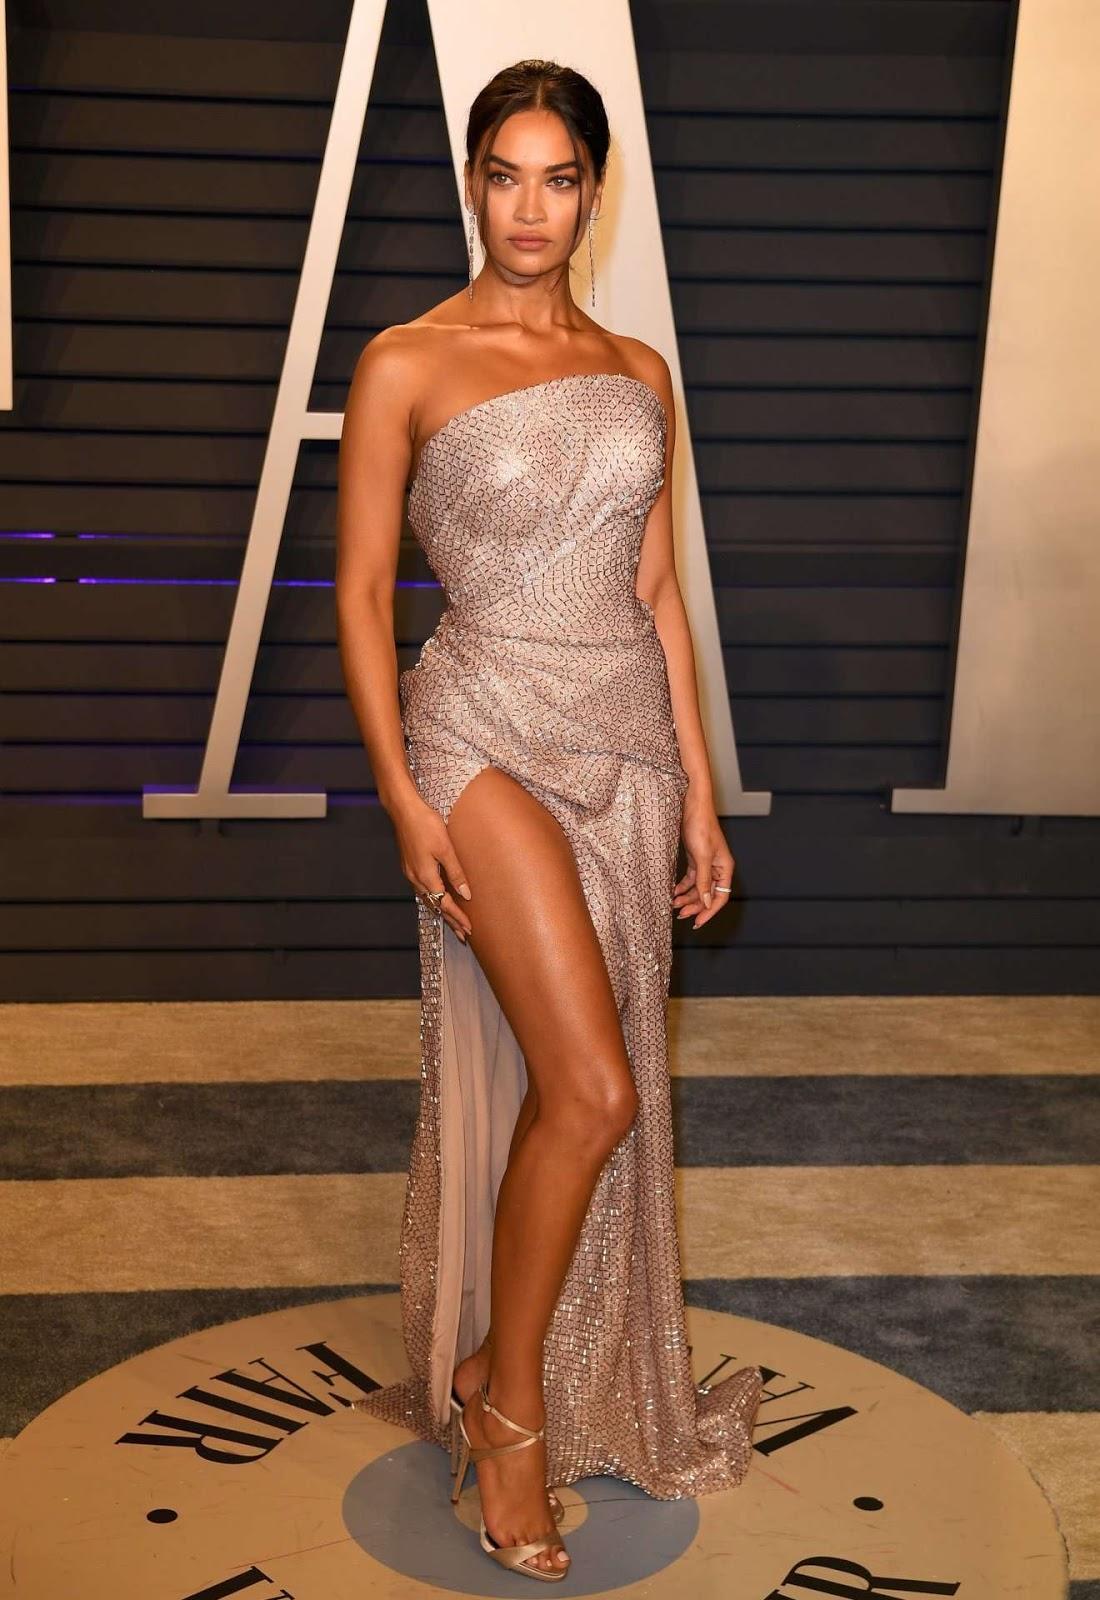 Shanina Shaik – Upskirt at 2019 Vanity Fair Oscar Party in Beverly Hills